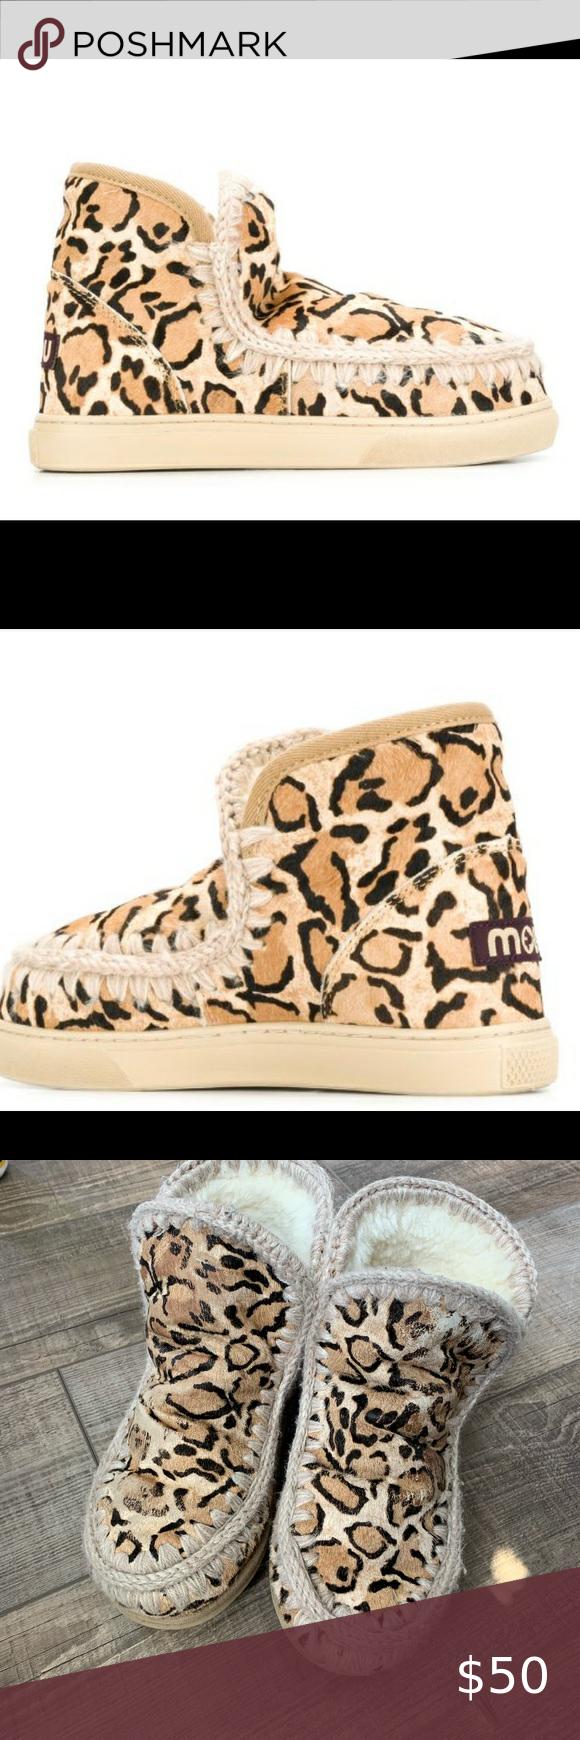 Mou leopard Eskimo boots in 2020